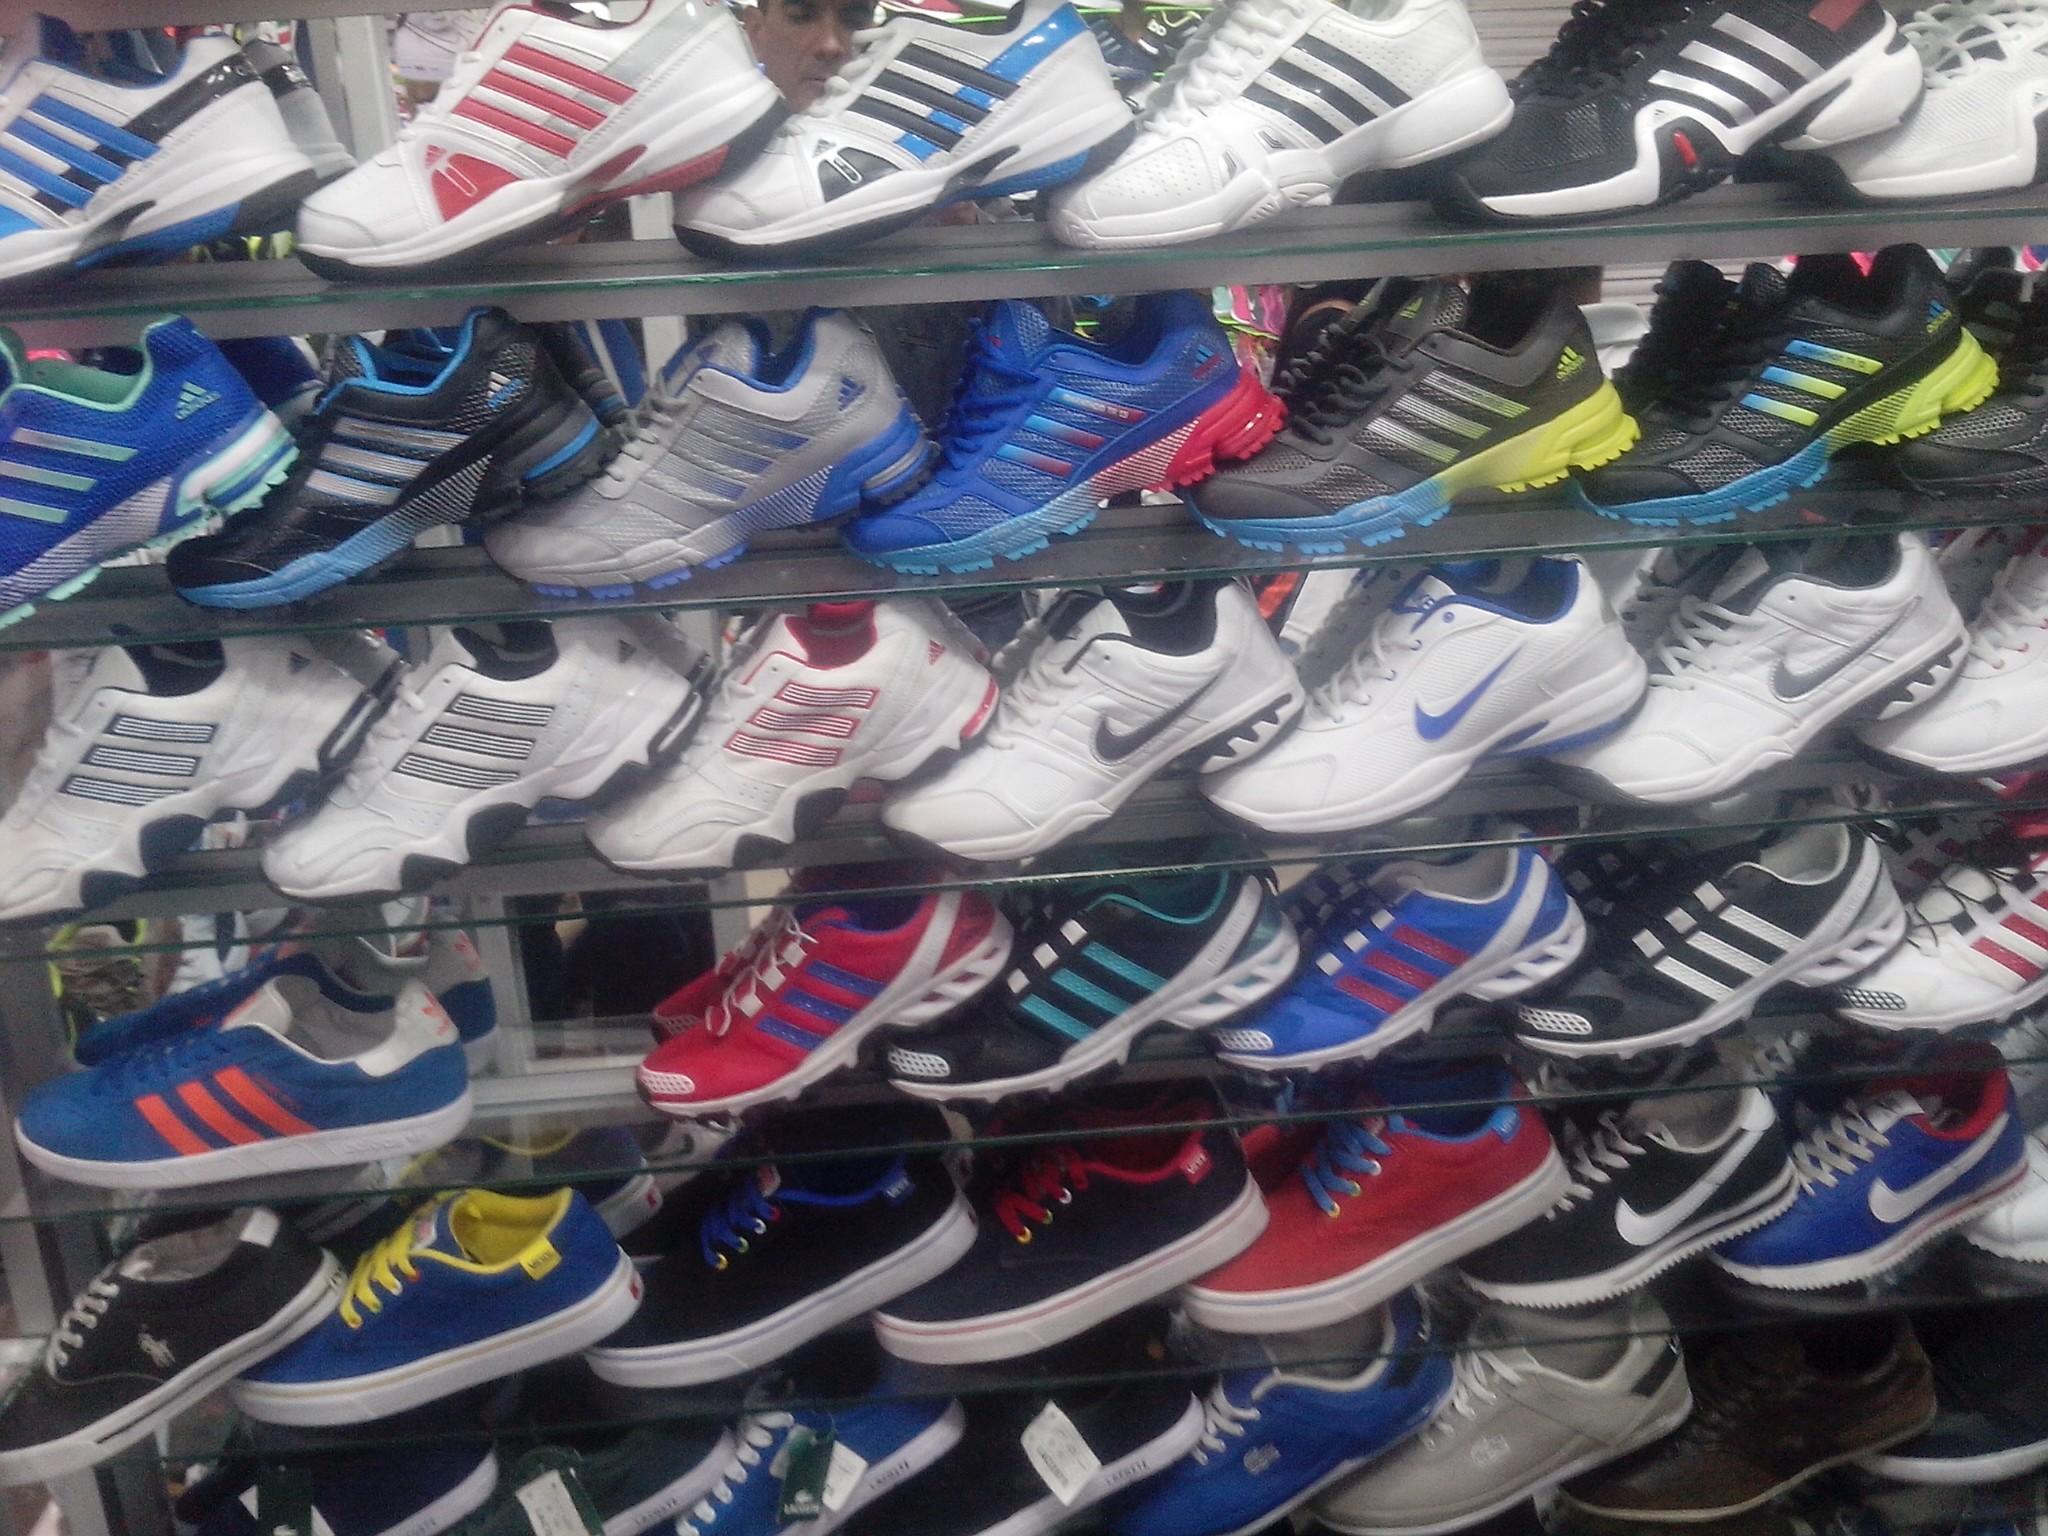 8a3e1af63fed5 Nike Online Santillana Tienda Compartir Bogota Compartirsantillana Yq4xw1Z